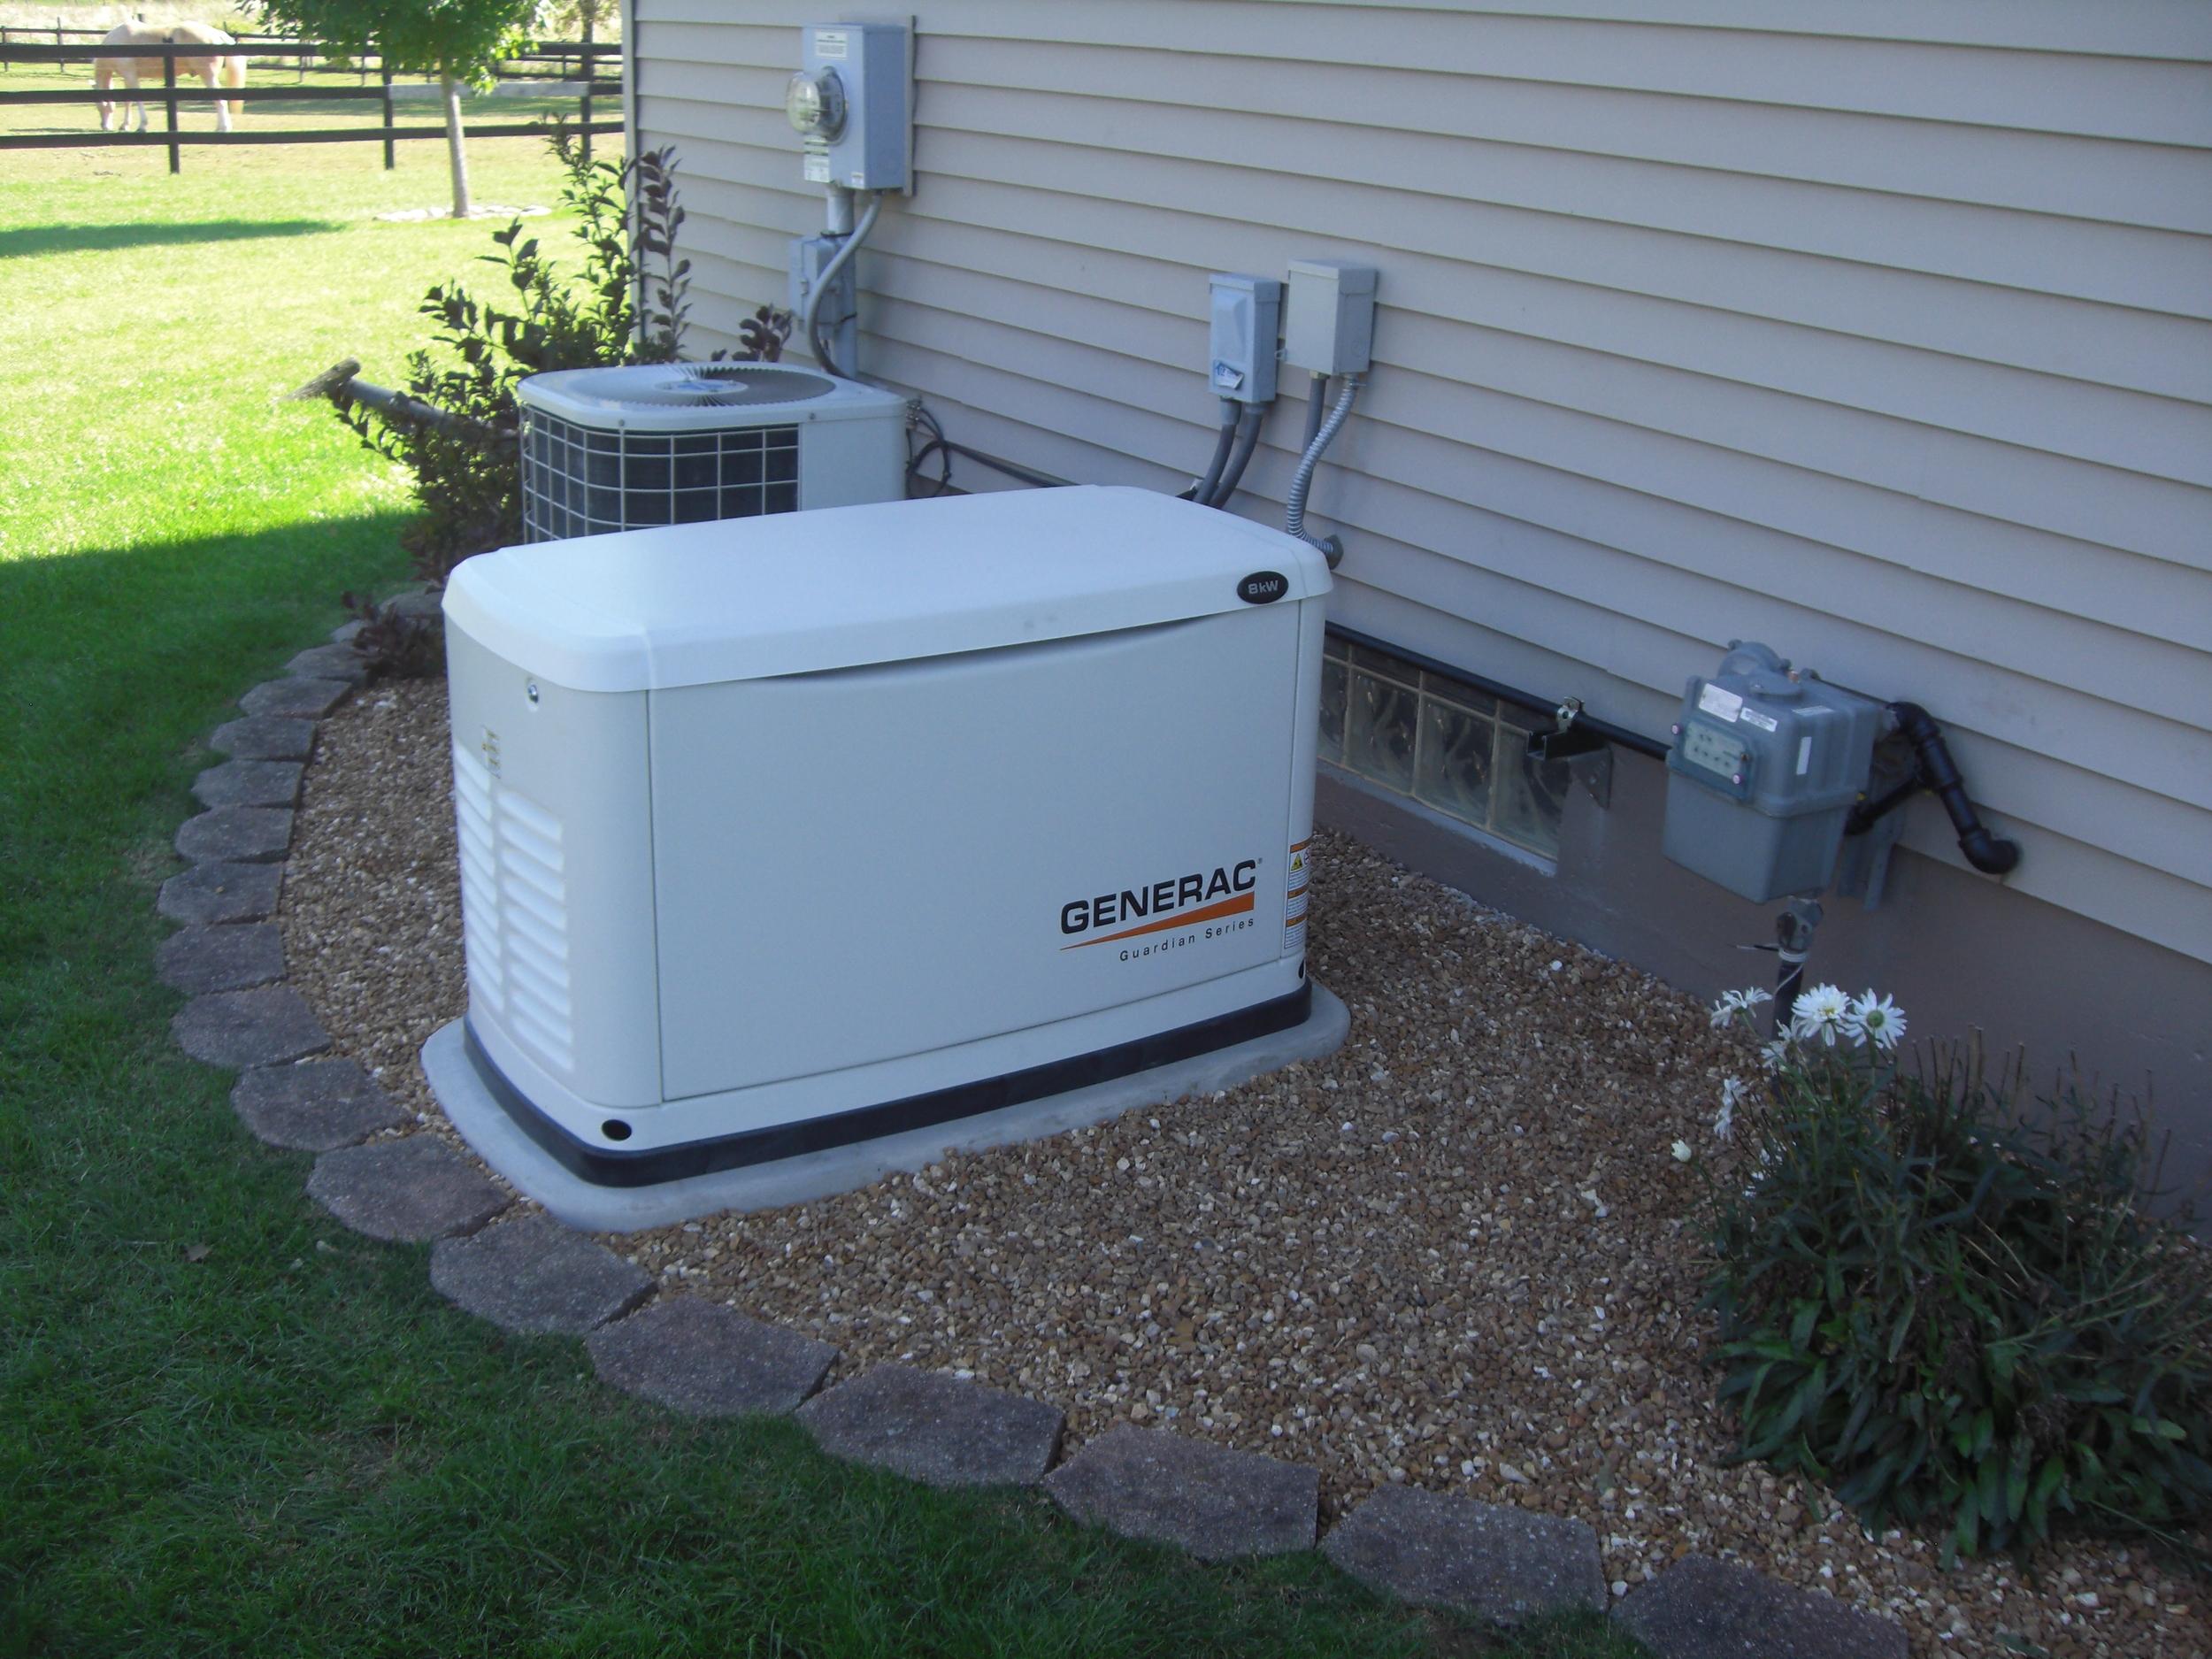 Generac-whole-house-generator